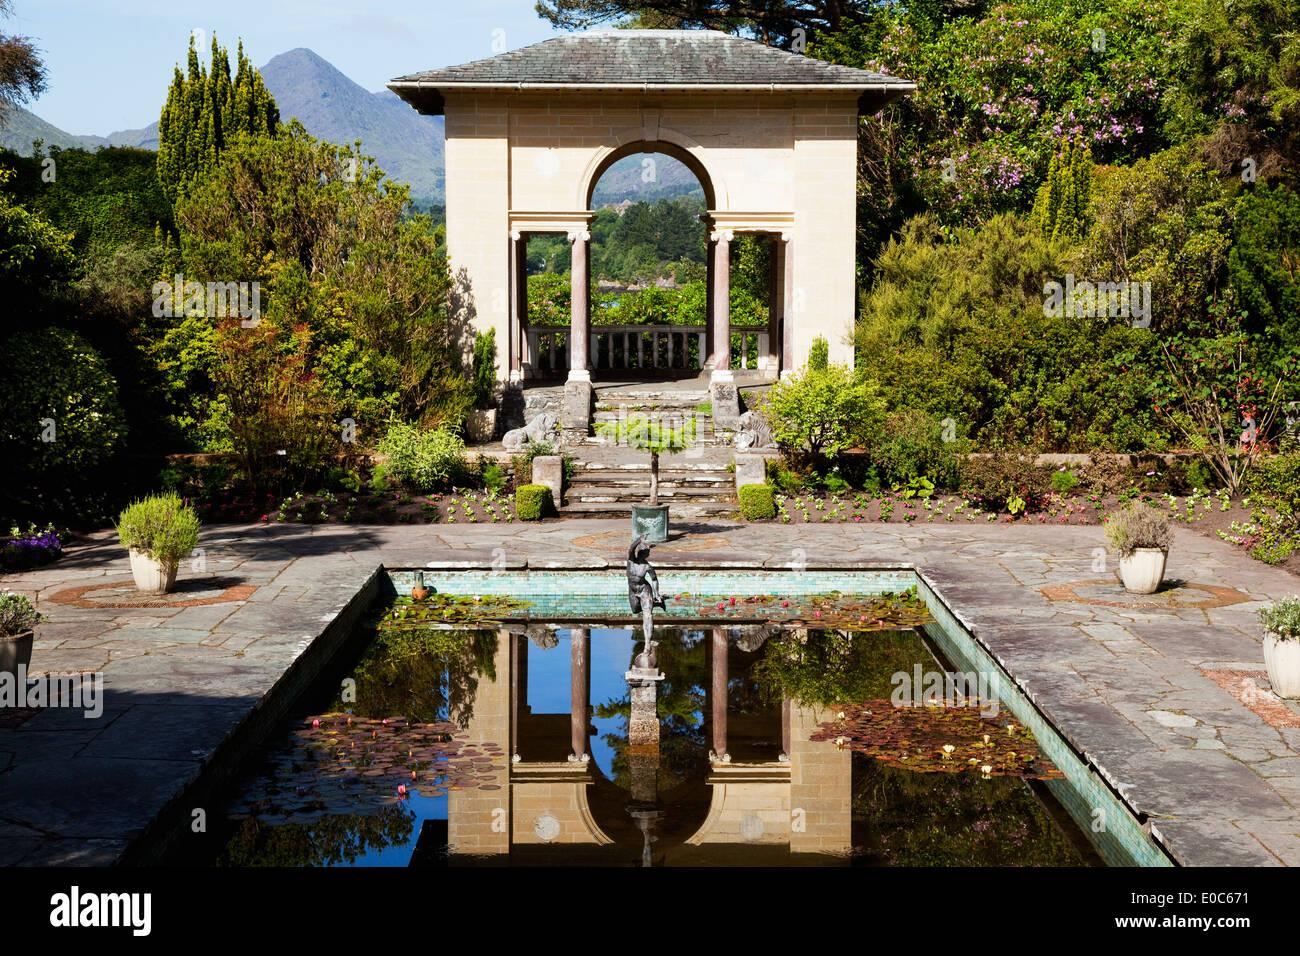 The Italian Gardens, near Glengarriff; County Cork, Ireland - Stock Image